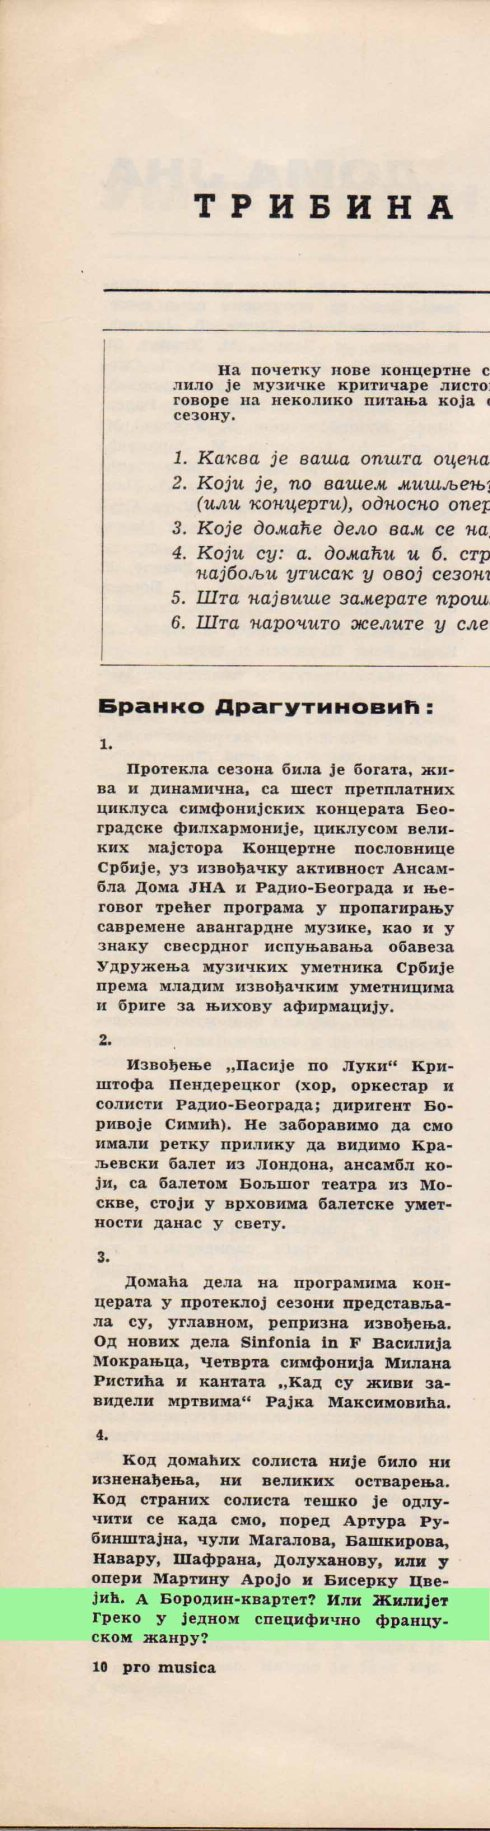 BORODIN QUARTET Beograd 1966